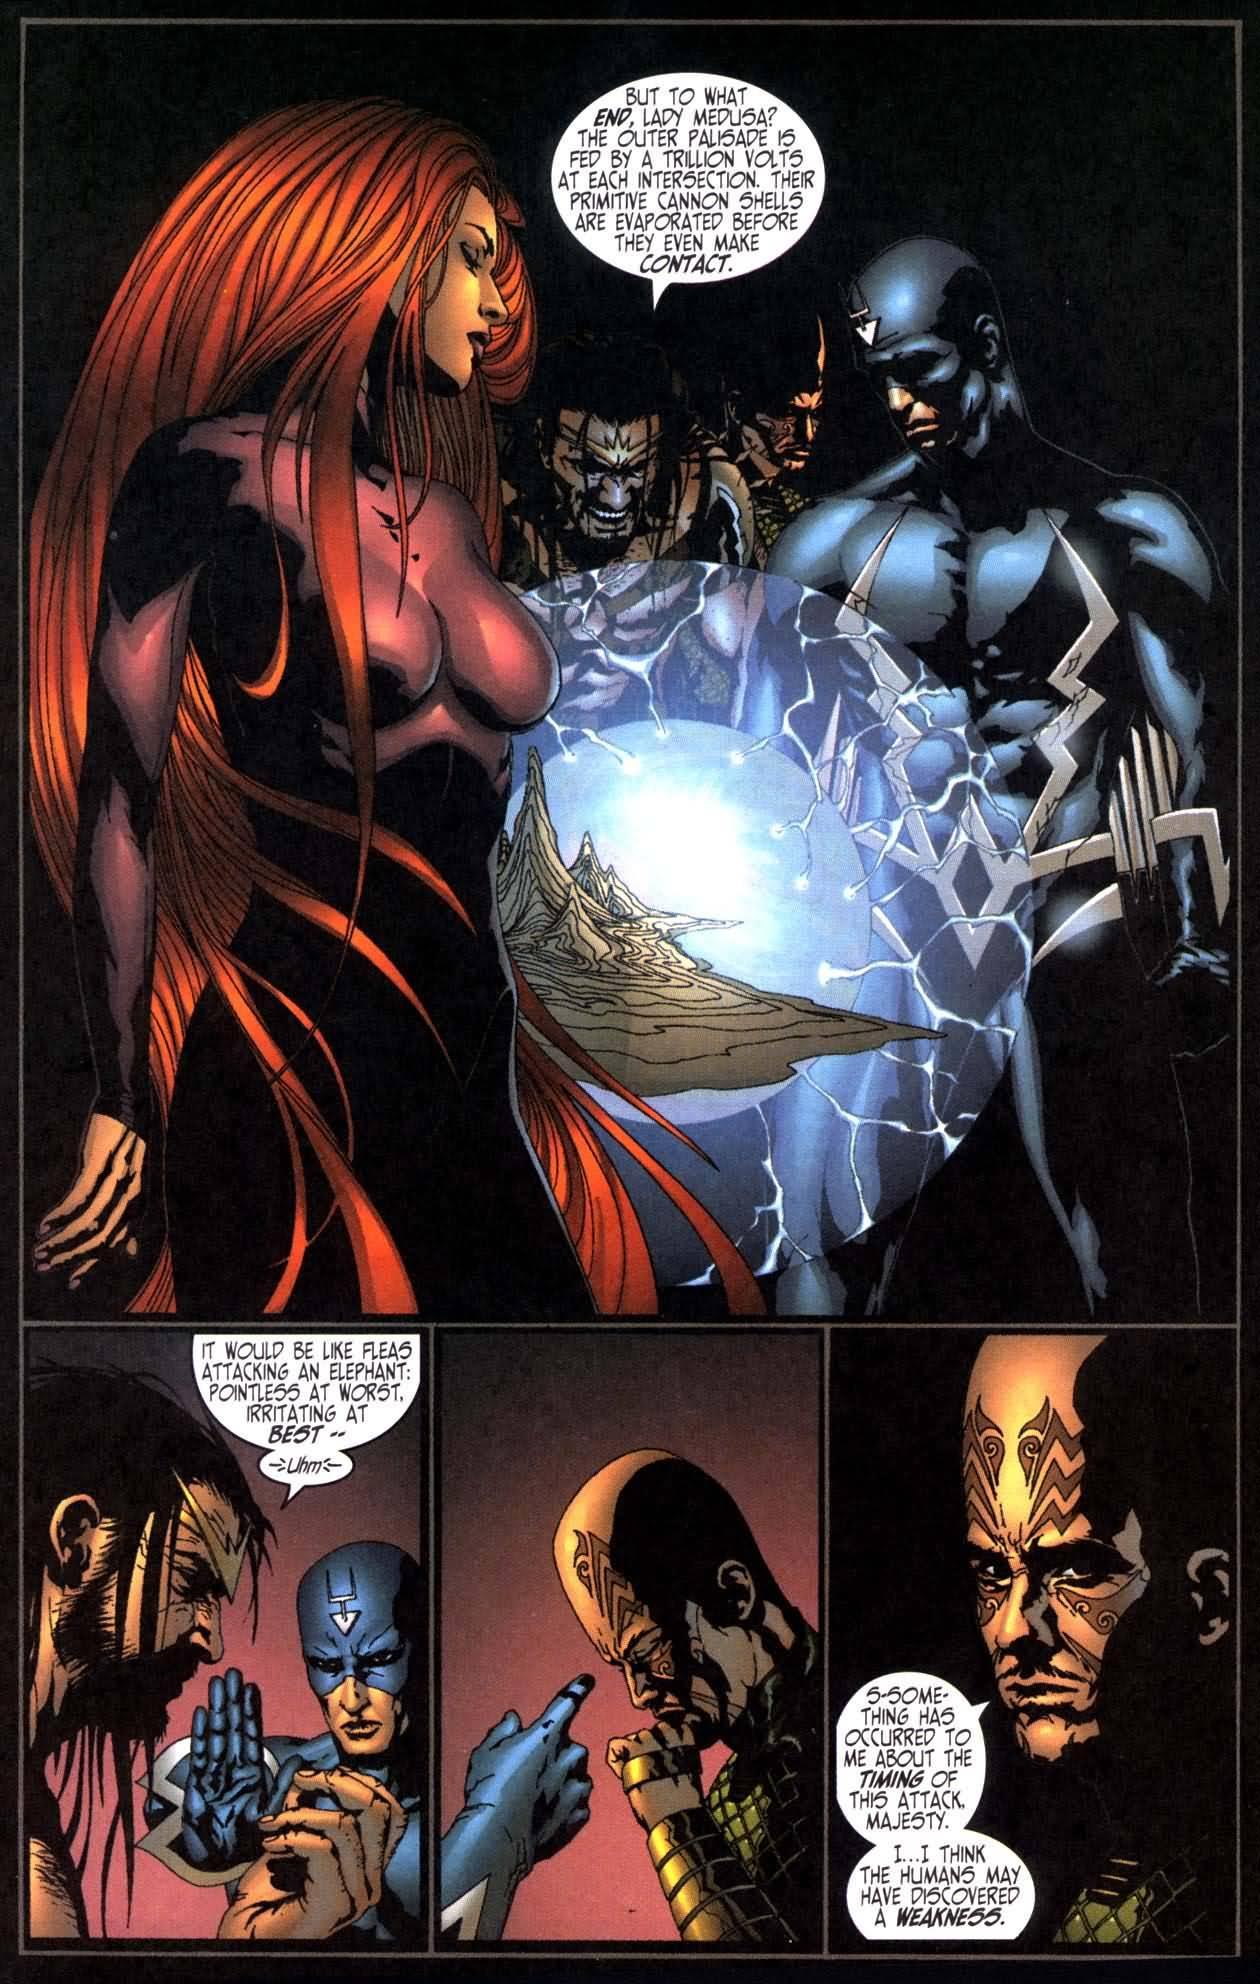 Inhumans V2 graphic novel review